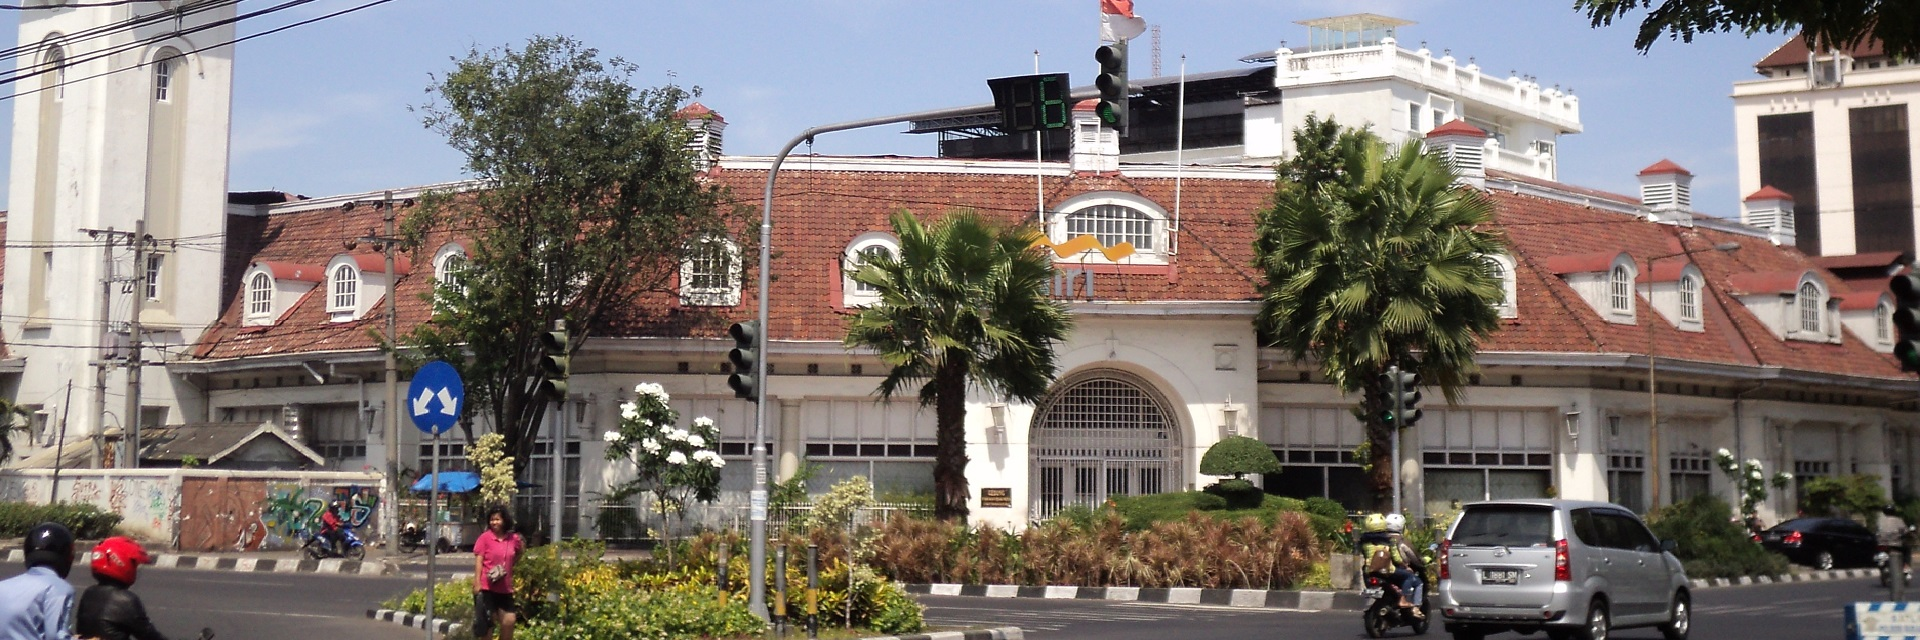 Kenapa Musti ke Surabaya, Kota Surabaya, Surabaya, Dolan Dolen, Dolaners Kenapa Musti ke Surabaya by febri rama - Dolan Dolen